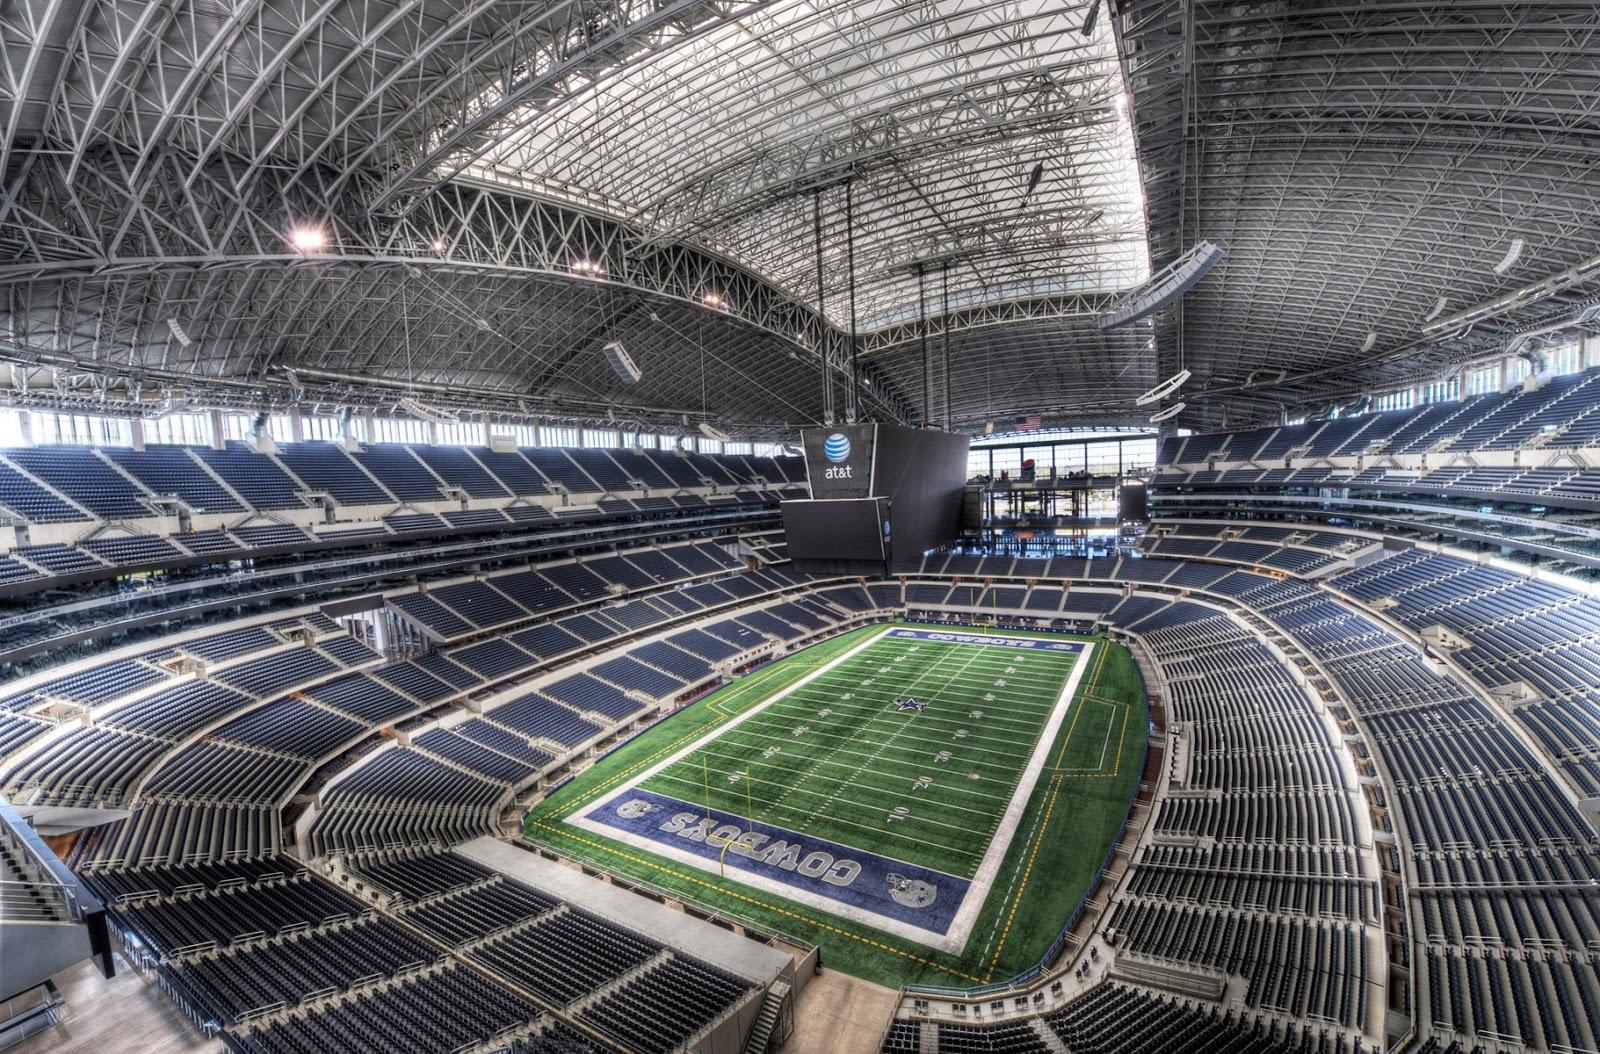 http://3.bp.blogspot.com/-HkBy1t1IHe8/UhYBNzOnW0I/AAAAAAAAB0U/5KbIPHW5xfo/s1600/cowboys-stadium1.jpeg